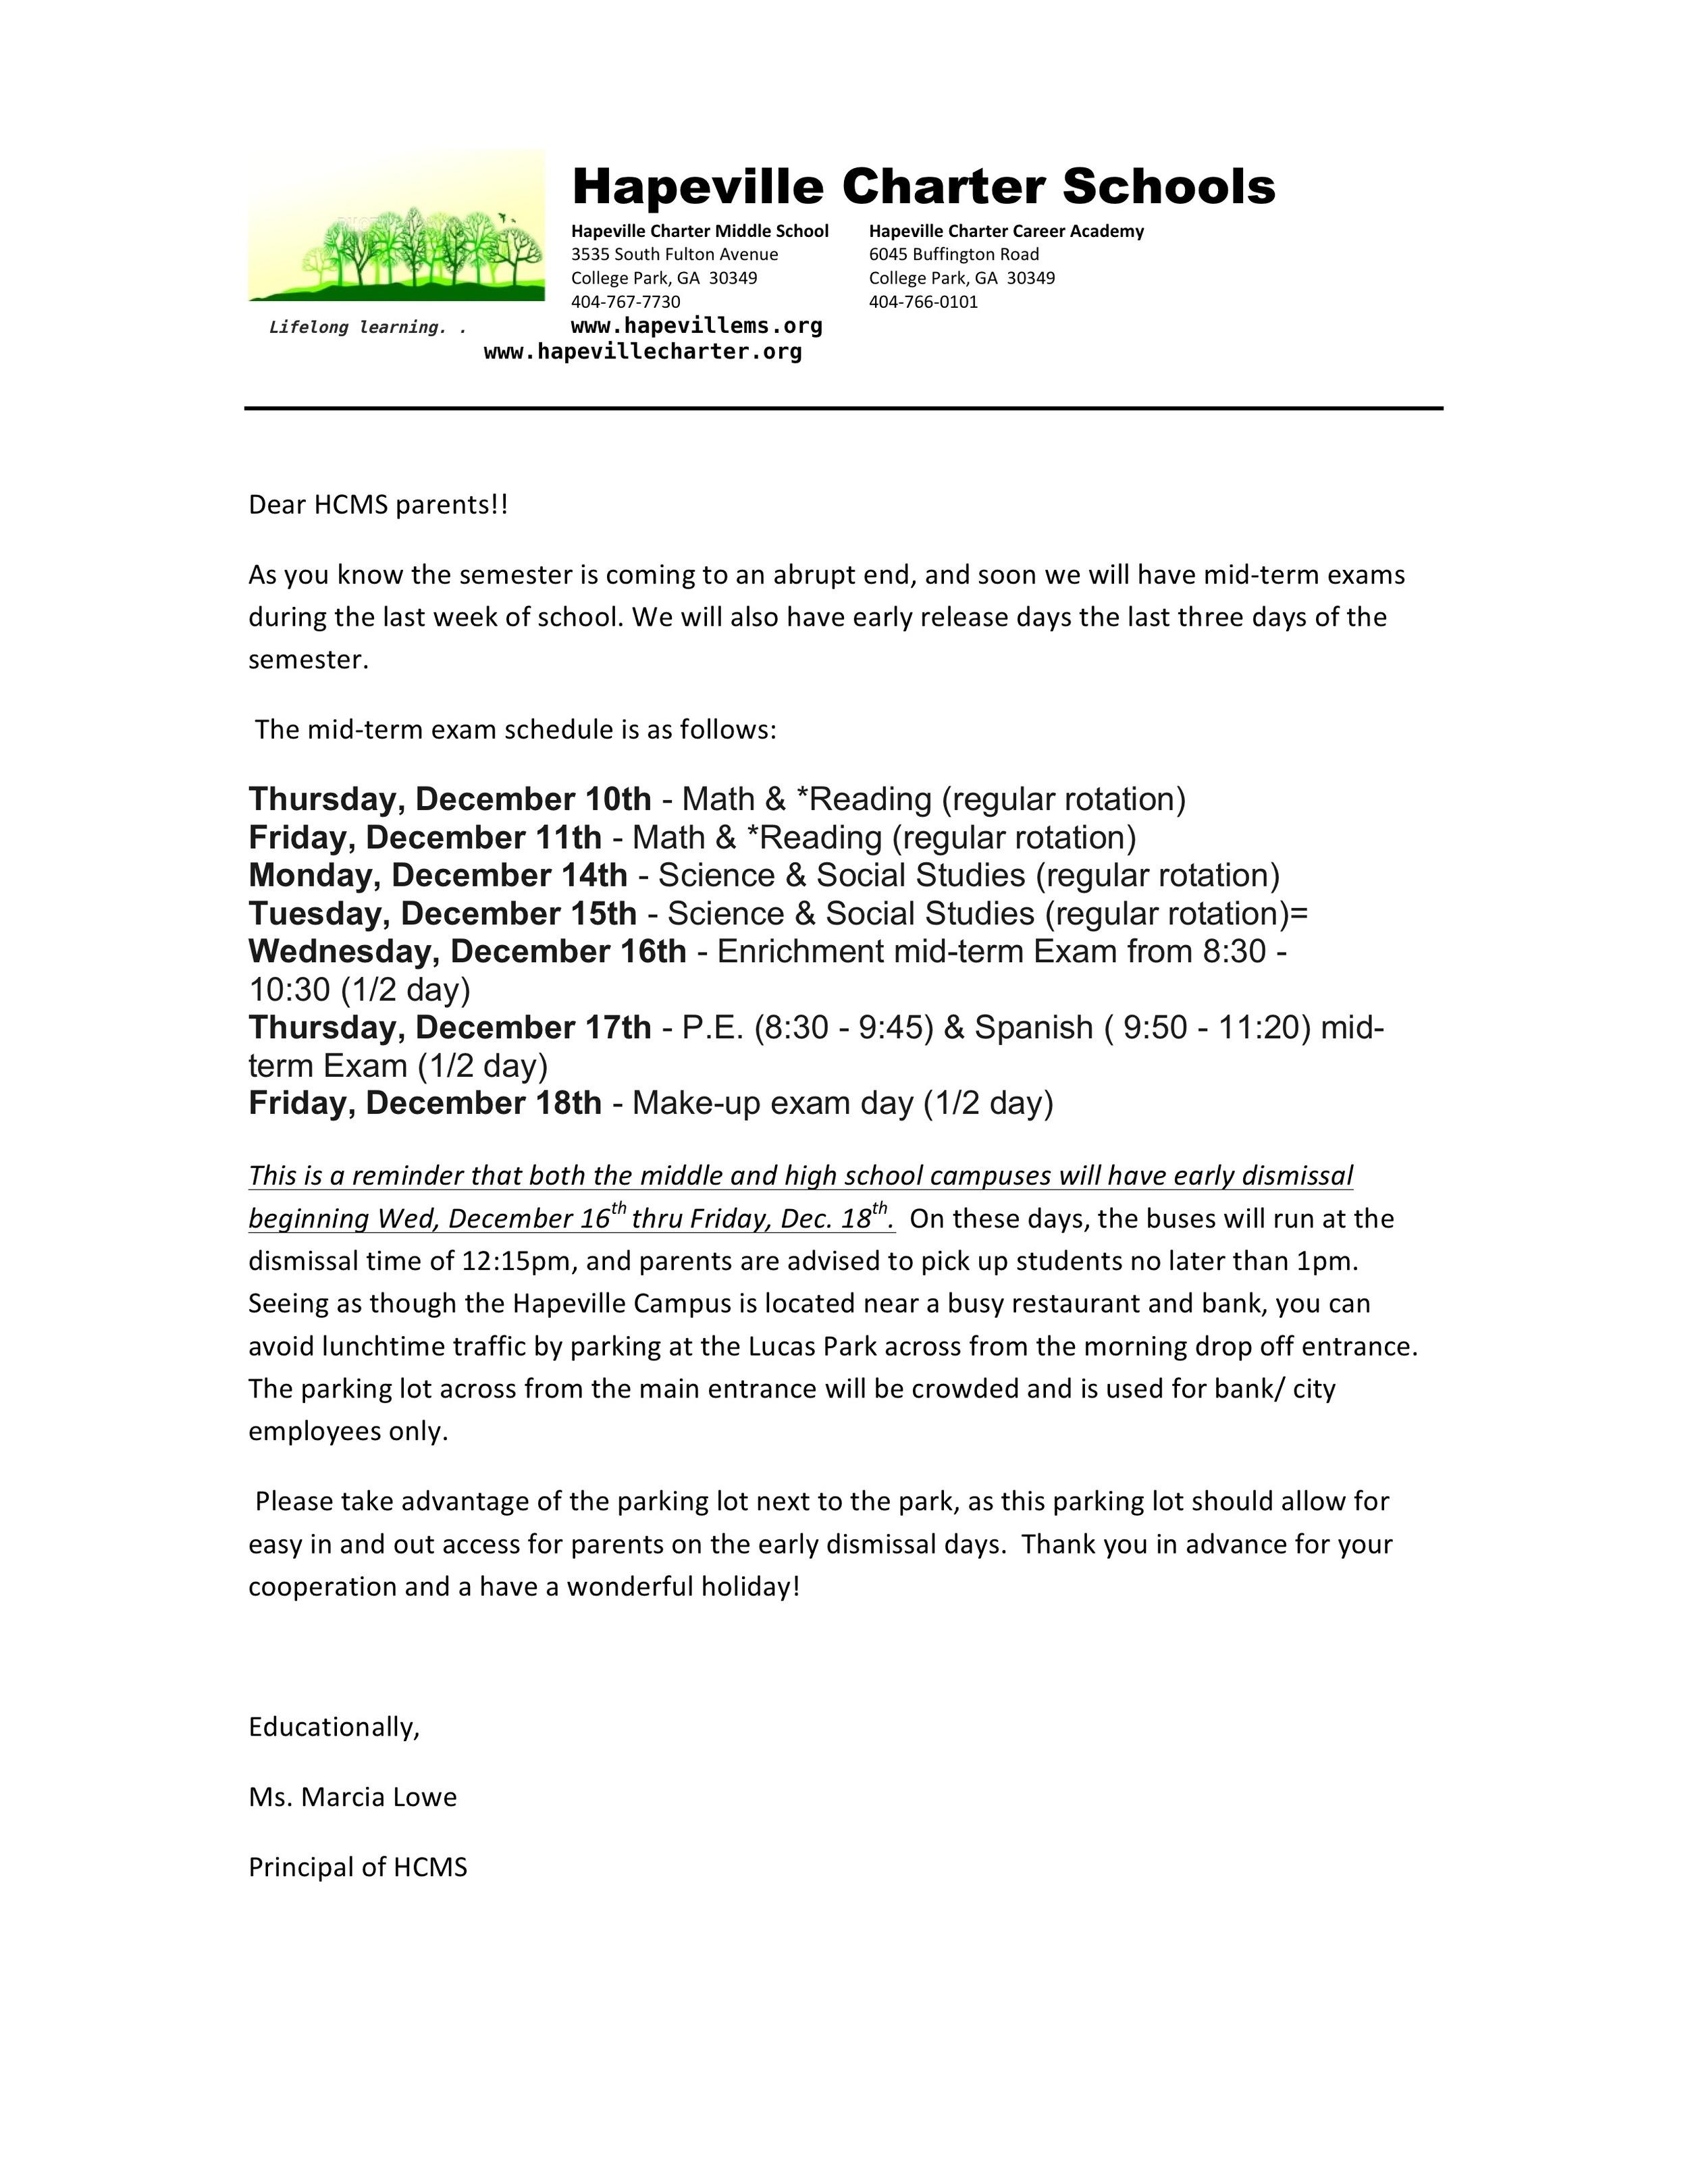 Newsletter Image6th grade dec 1 2015 3.jpeg